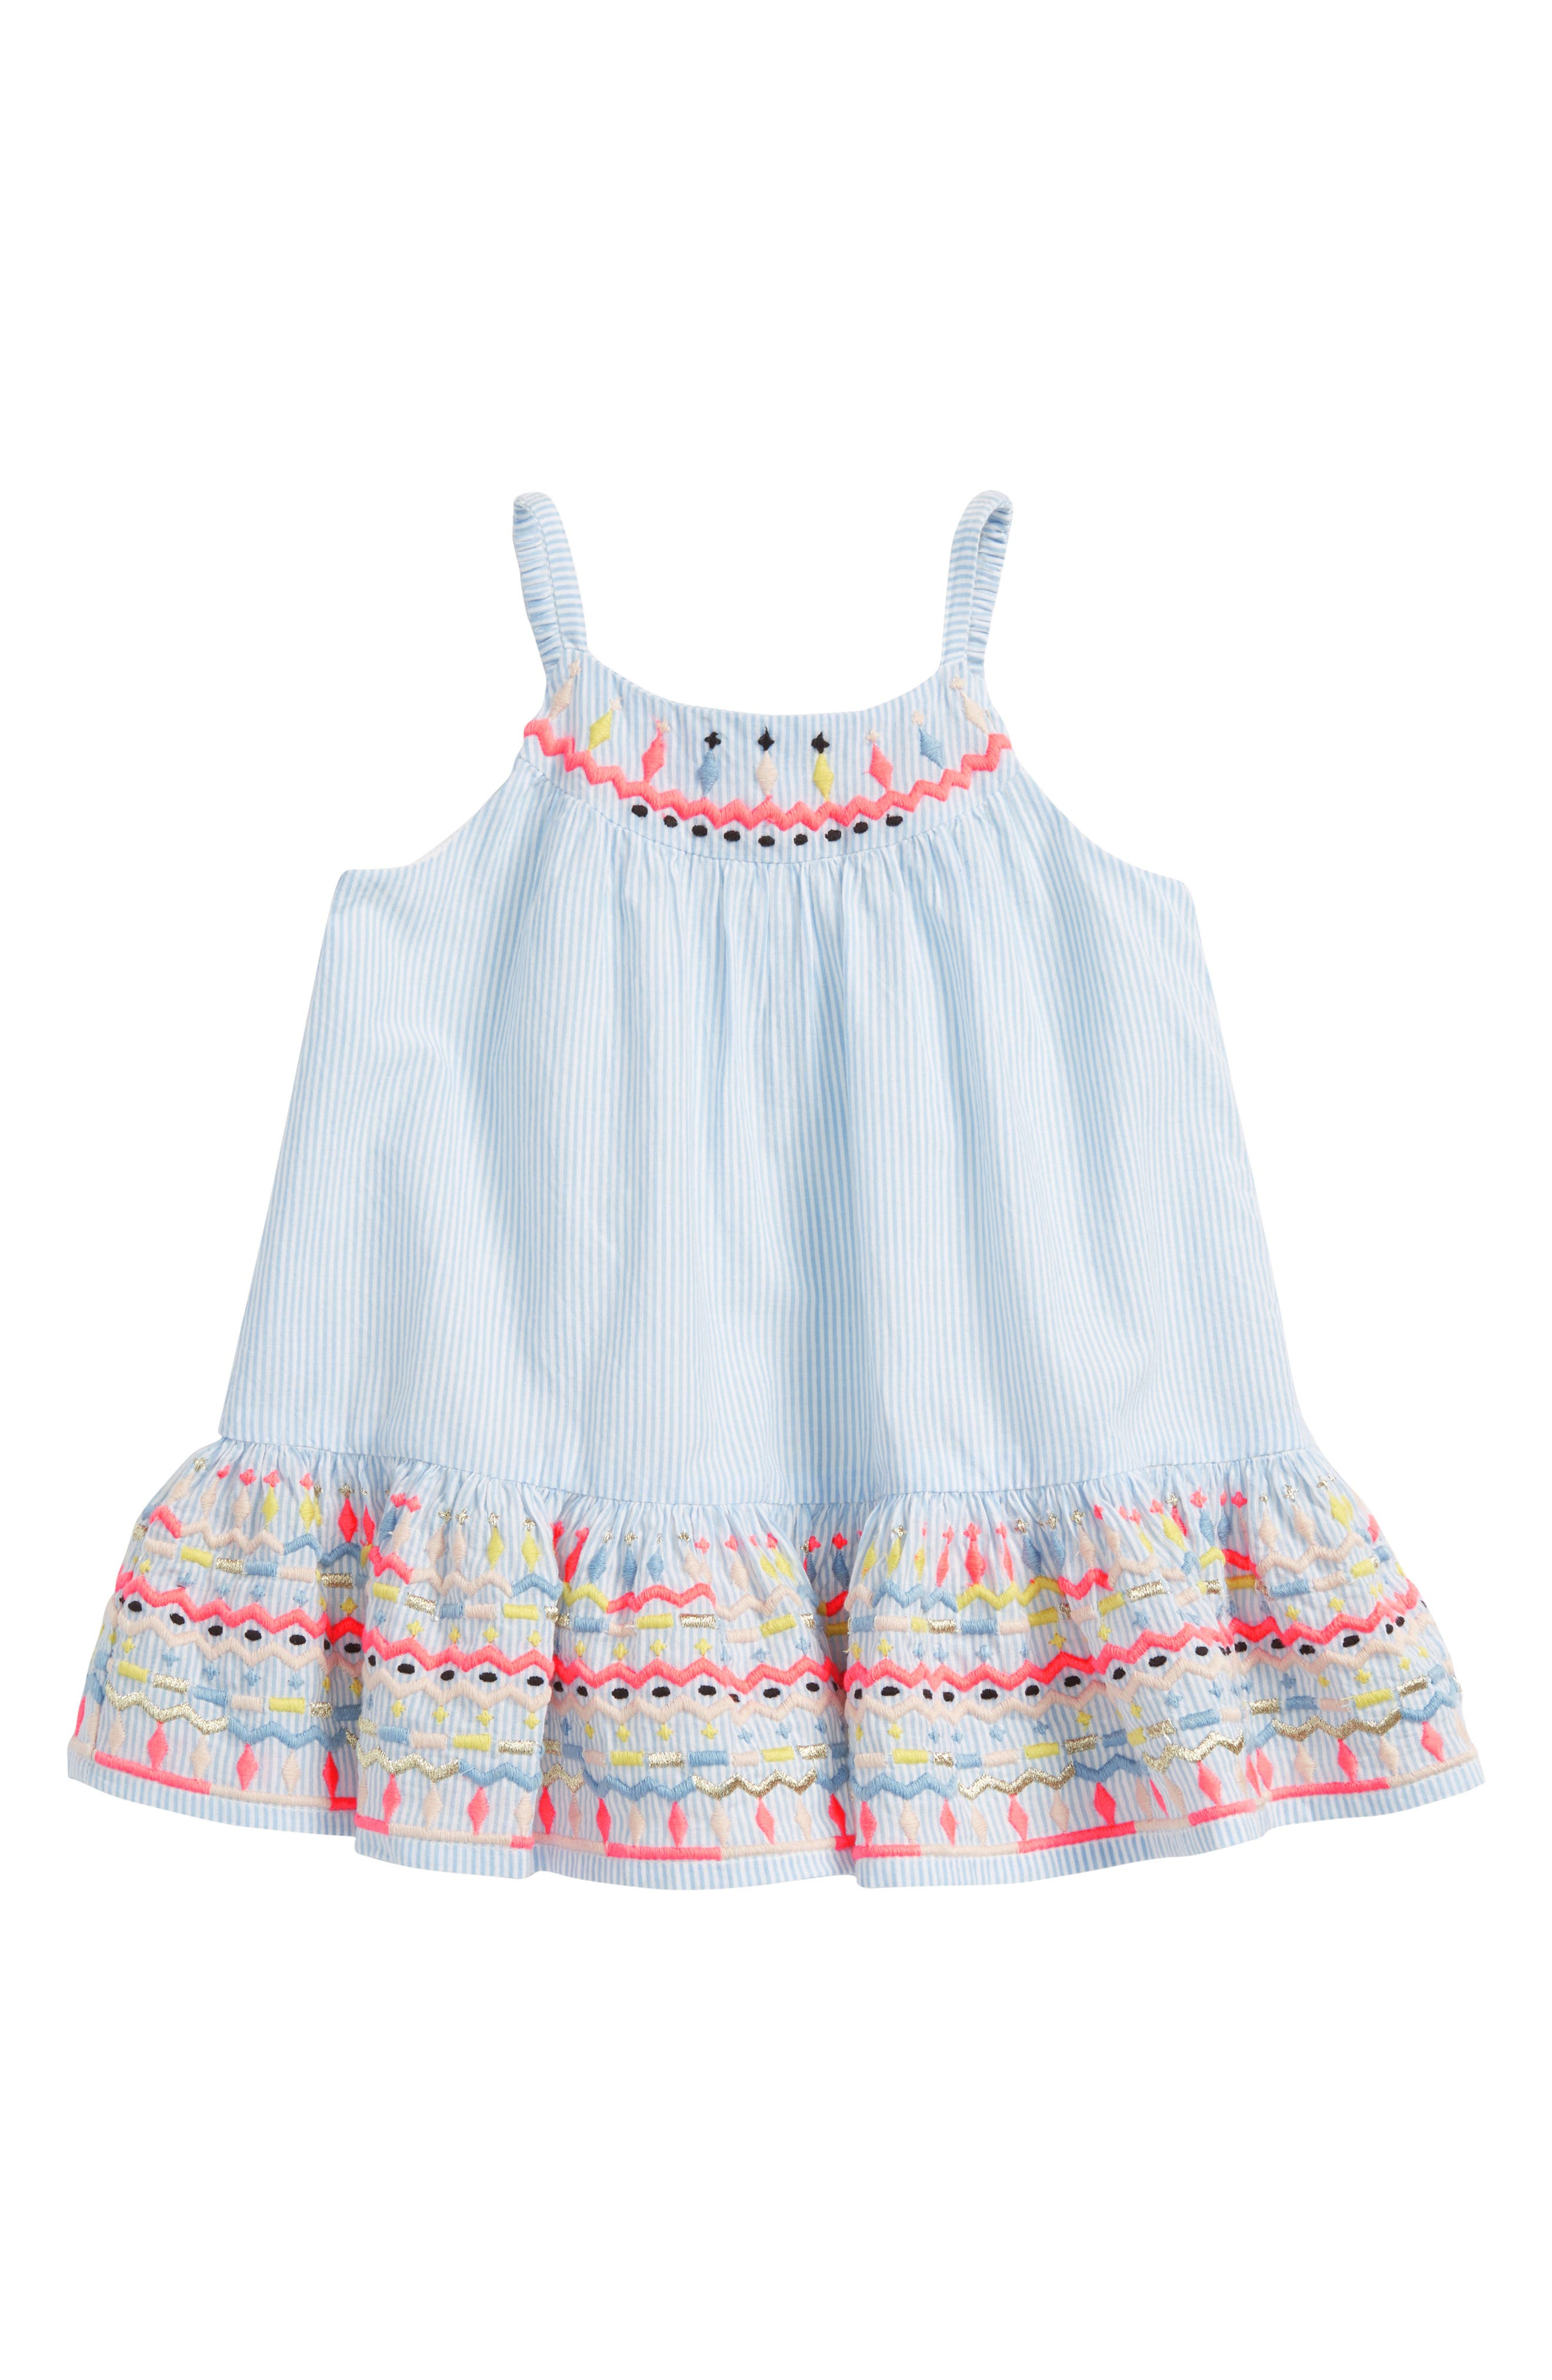 Gia Dress,                             Main thumbnail 1, color,                             Neon Coral